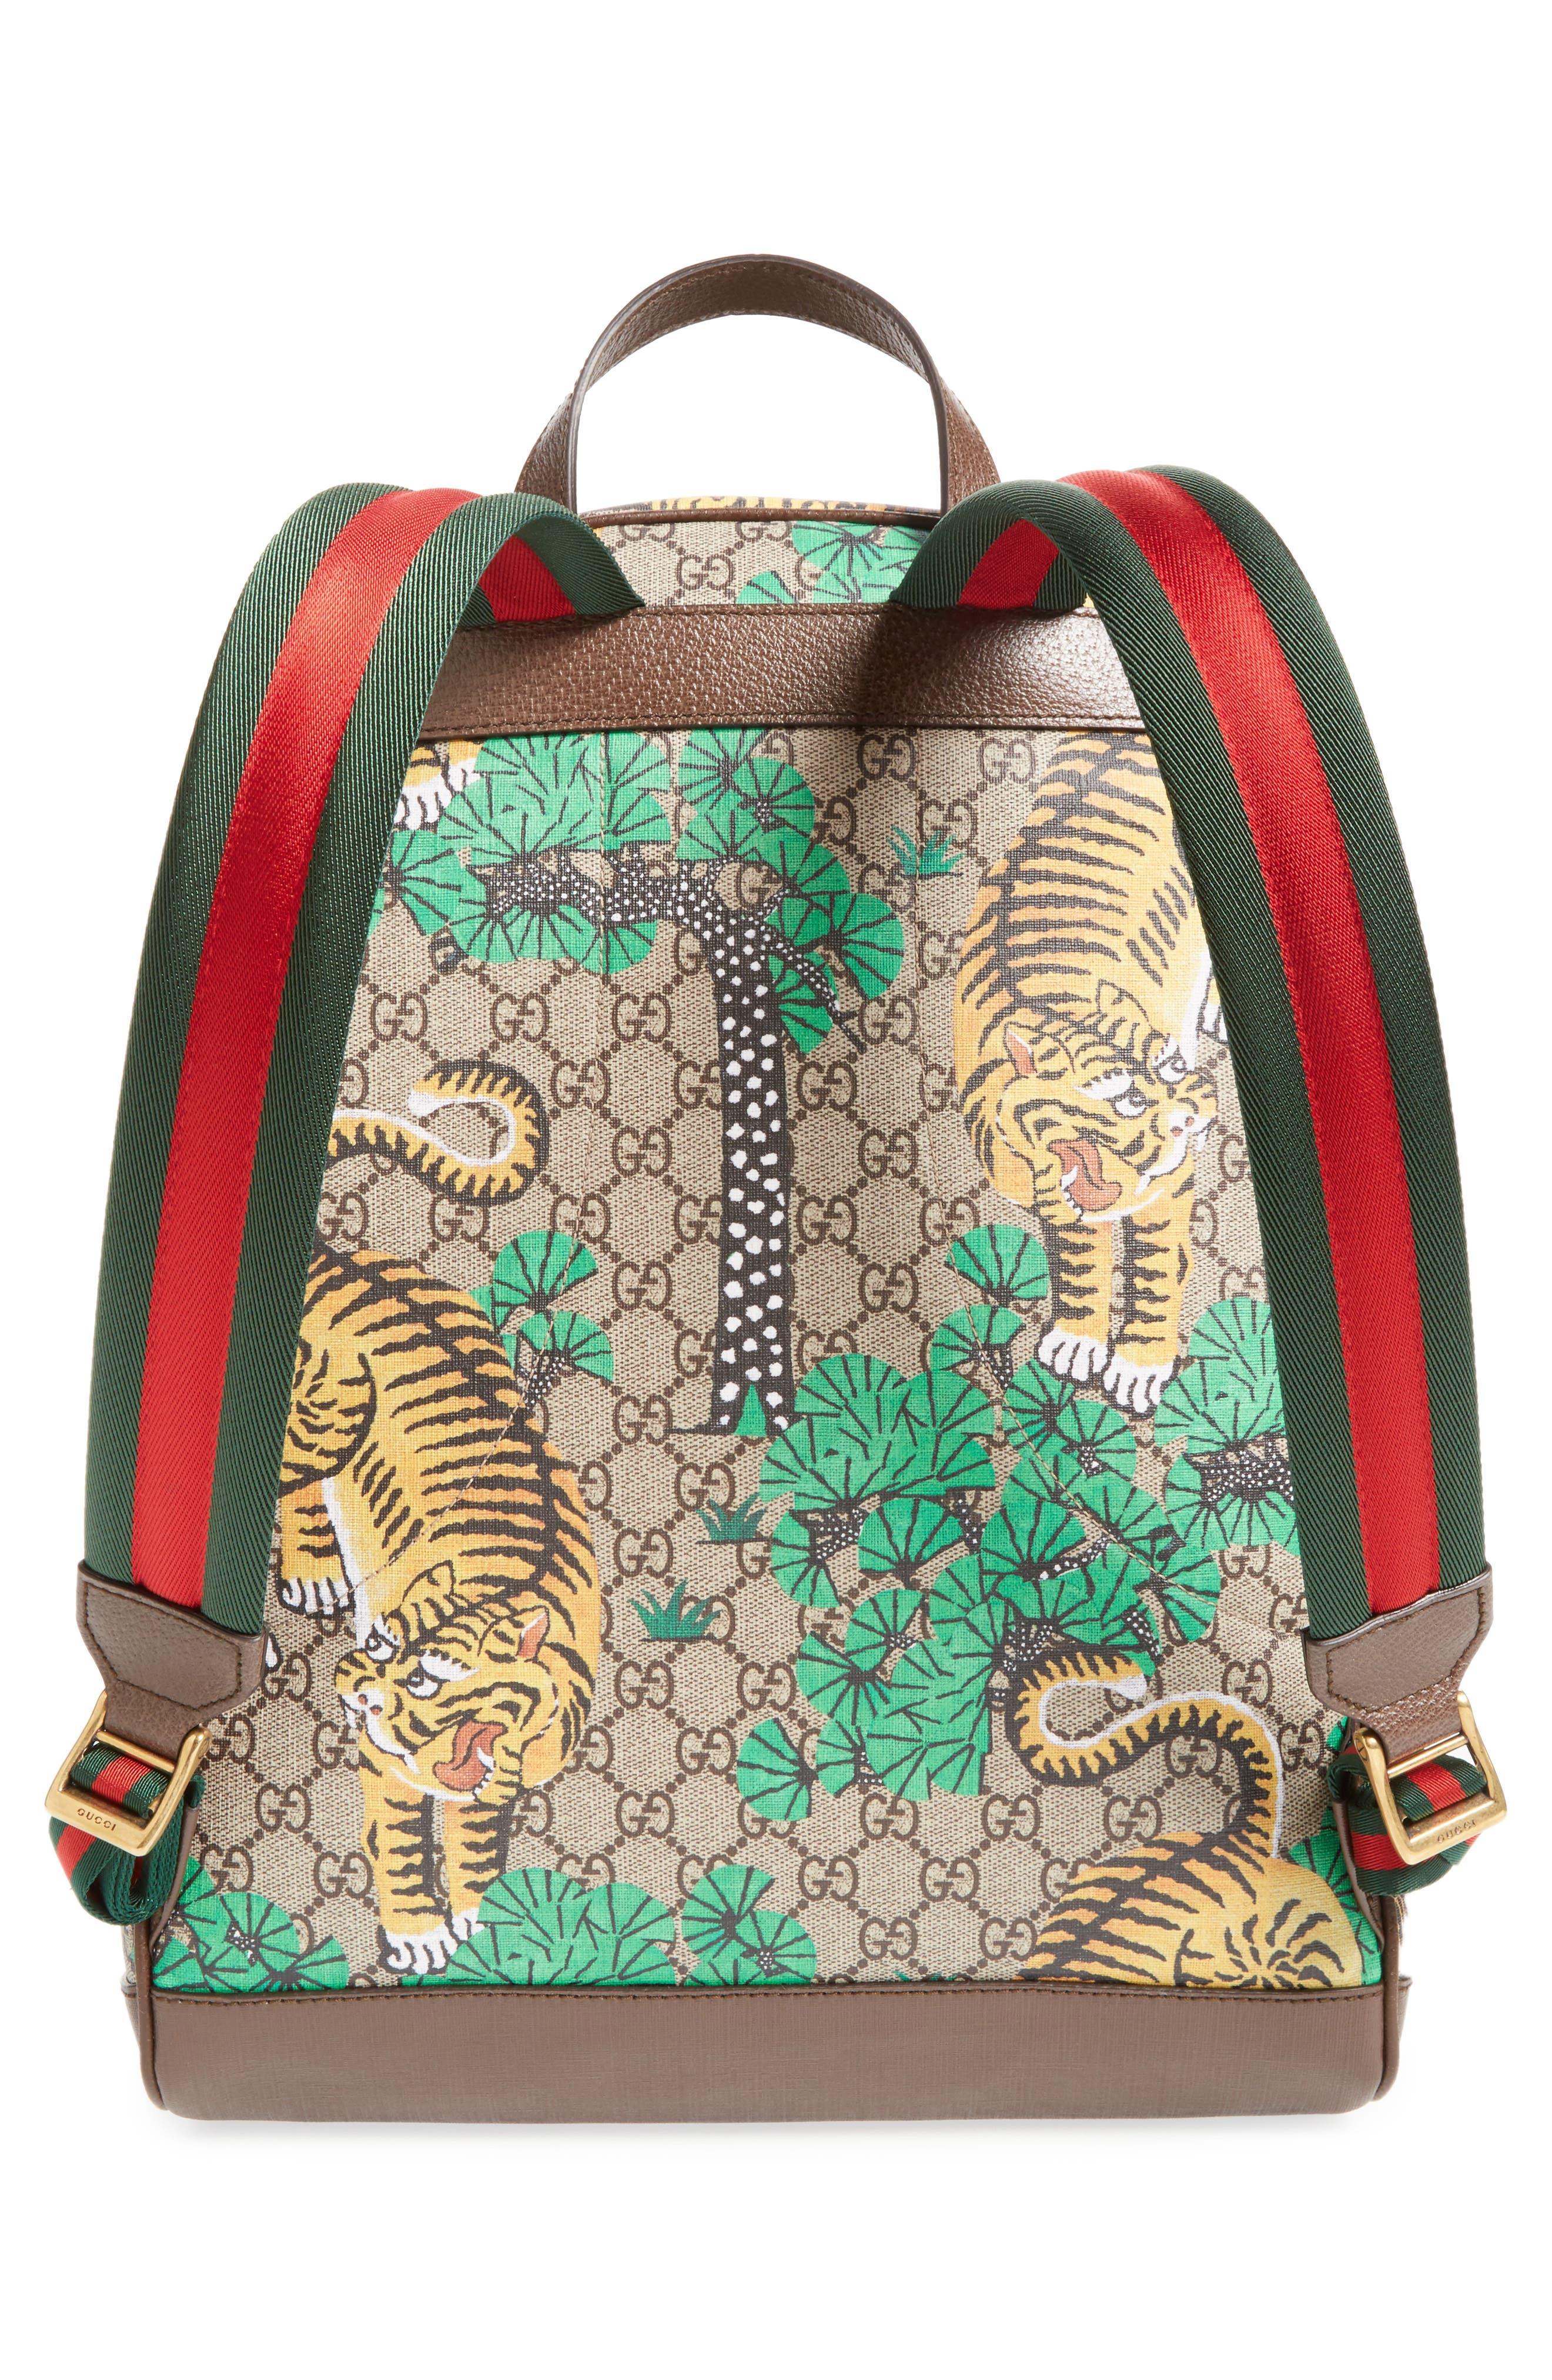 Tiger Cub Supreme Canvas Backpack,                             Alternate thumbnail 3, color,                             250